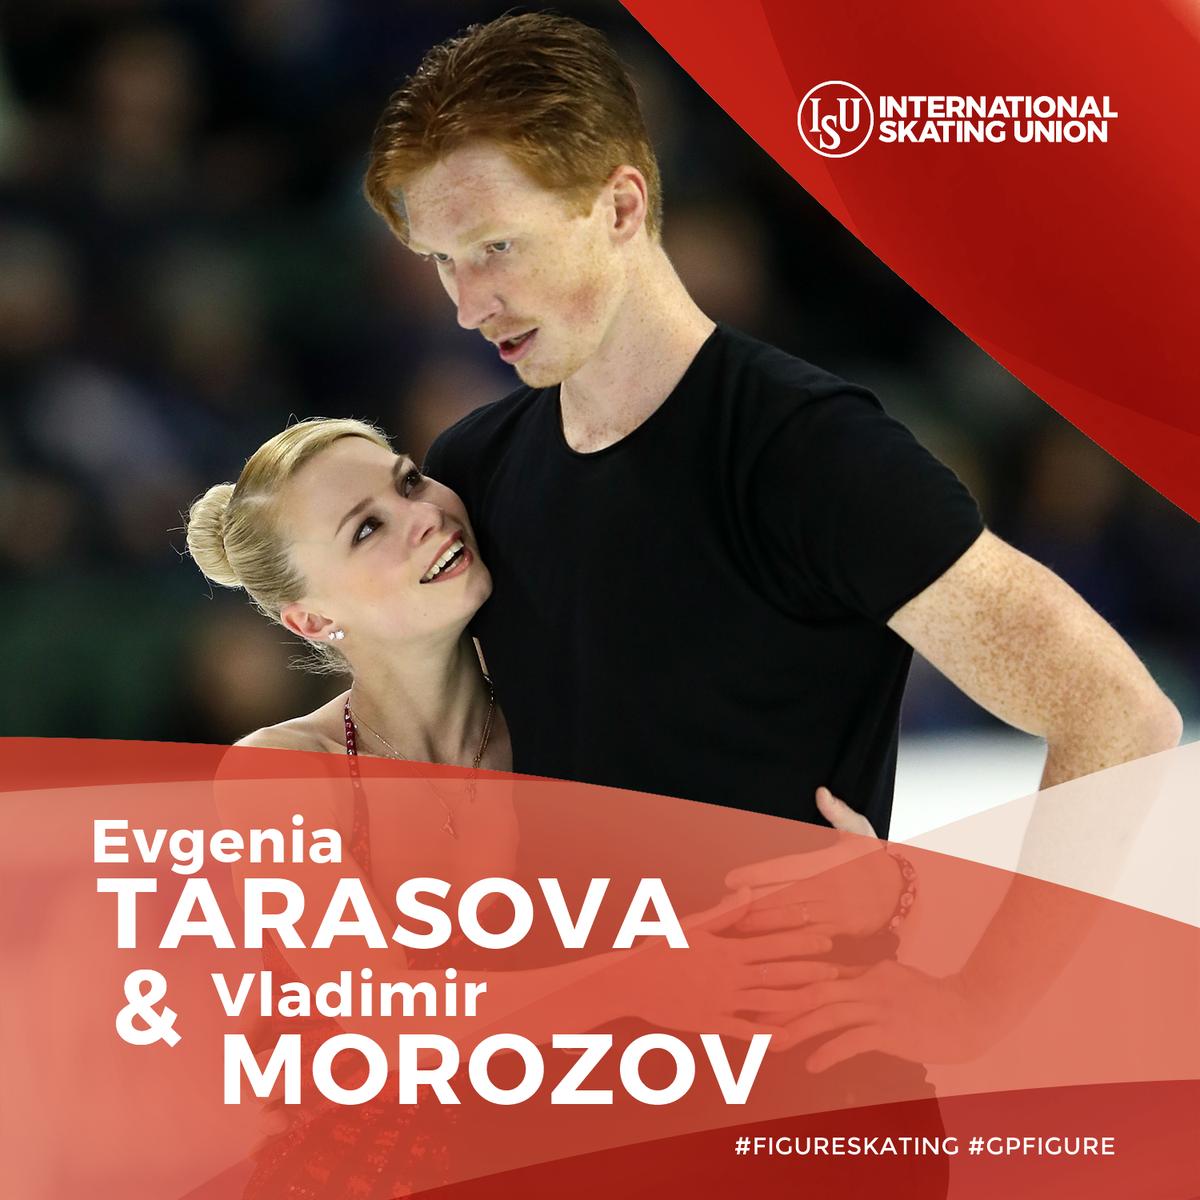 Евгения Тарасова - Владимир Морозов-2 - Страница 15 Dp7G-MpWkAATN4Y